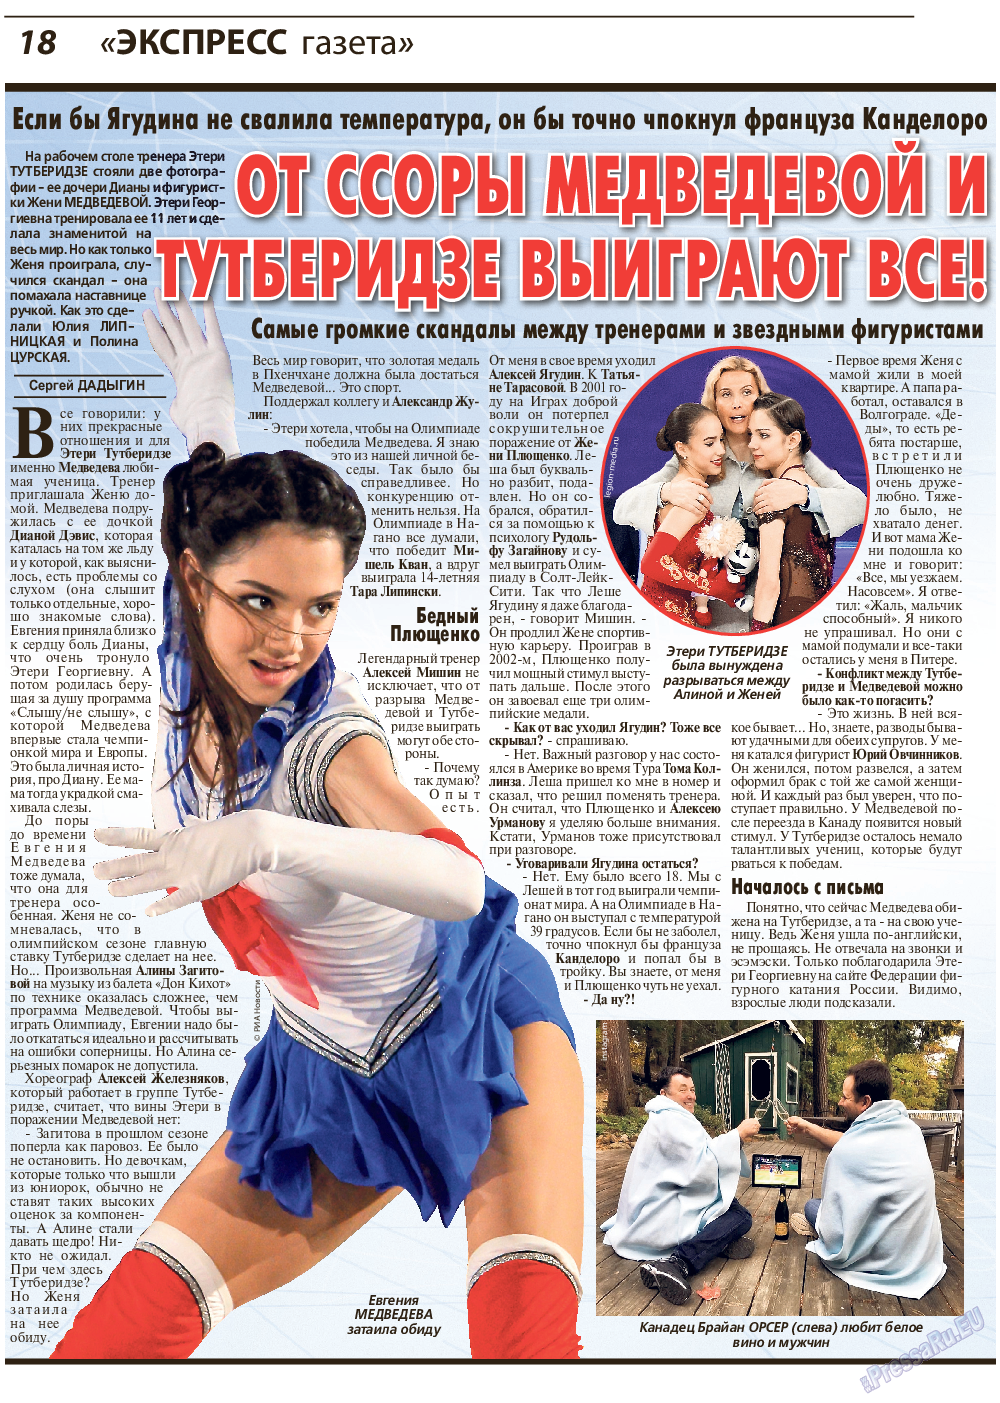 Экспресс газета (газета). 2018 год, номер 6, стр. 18